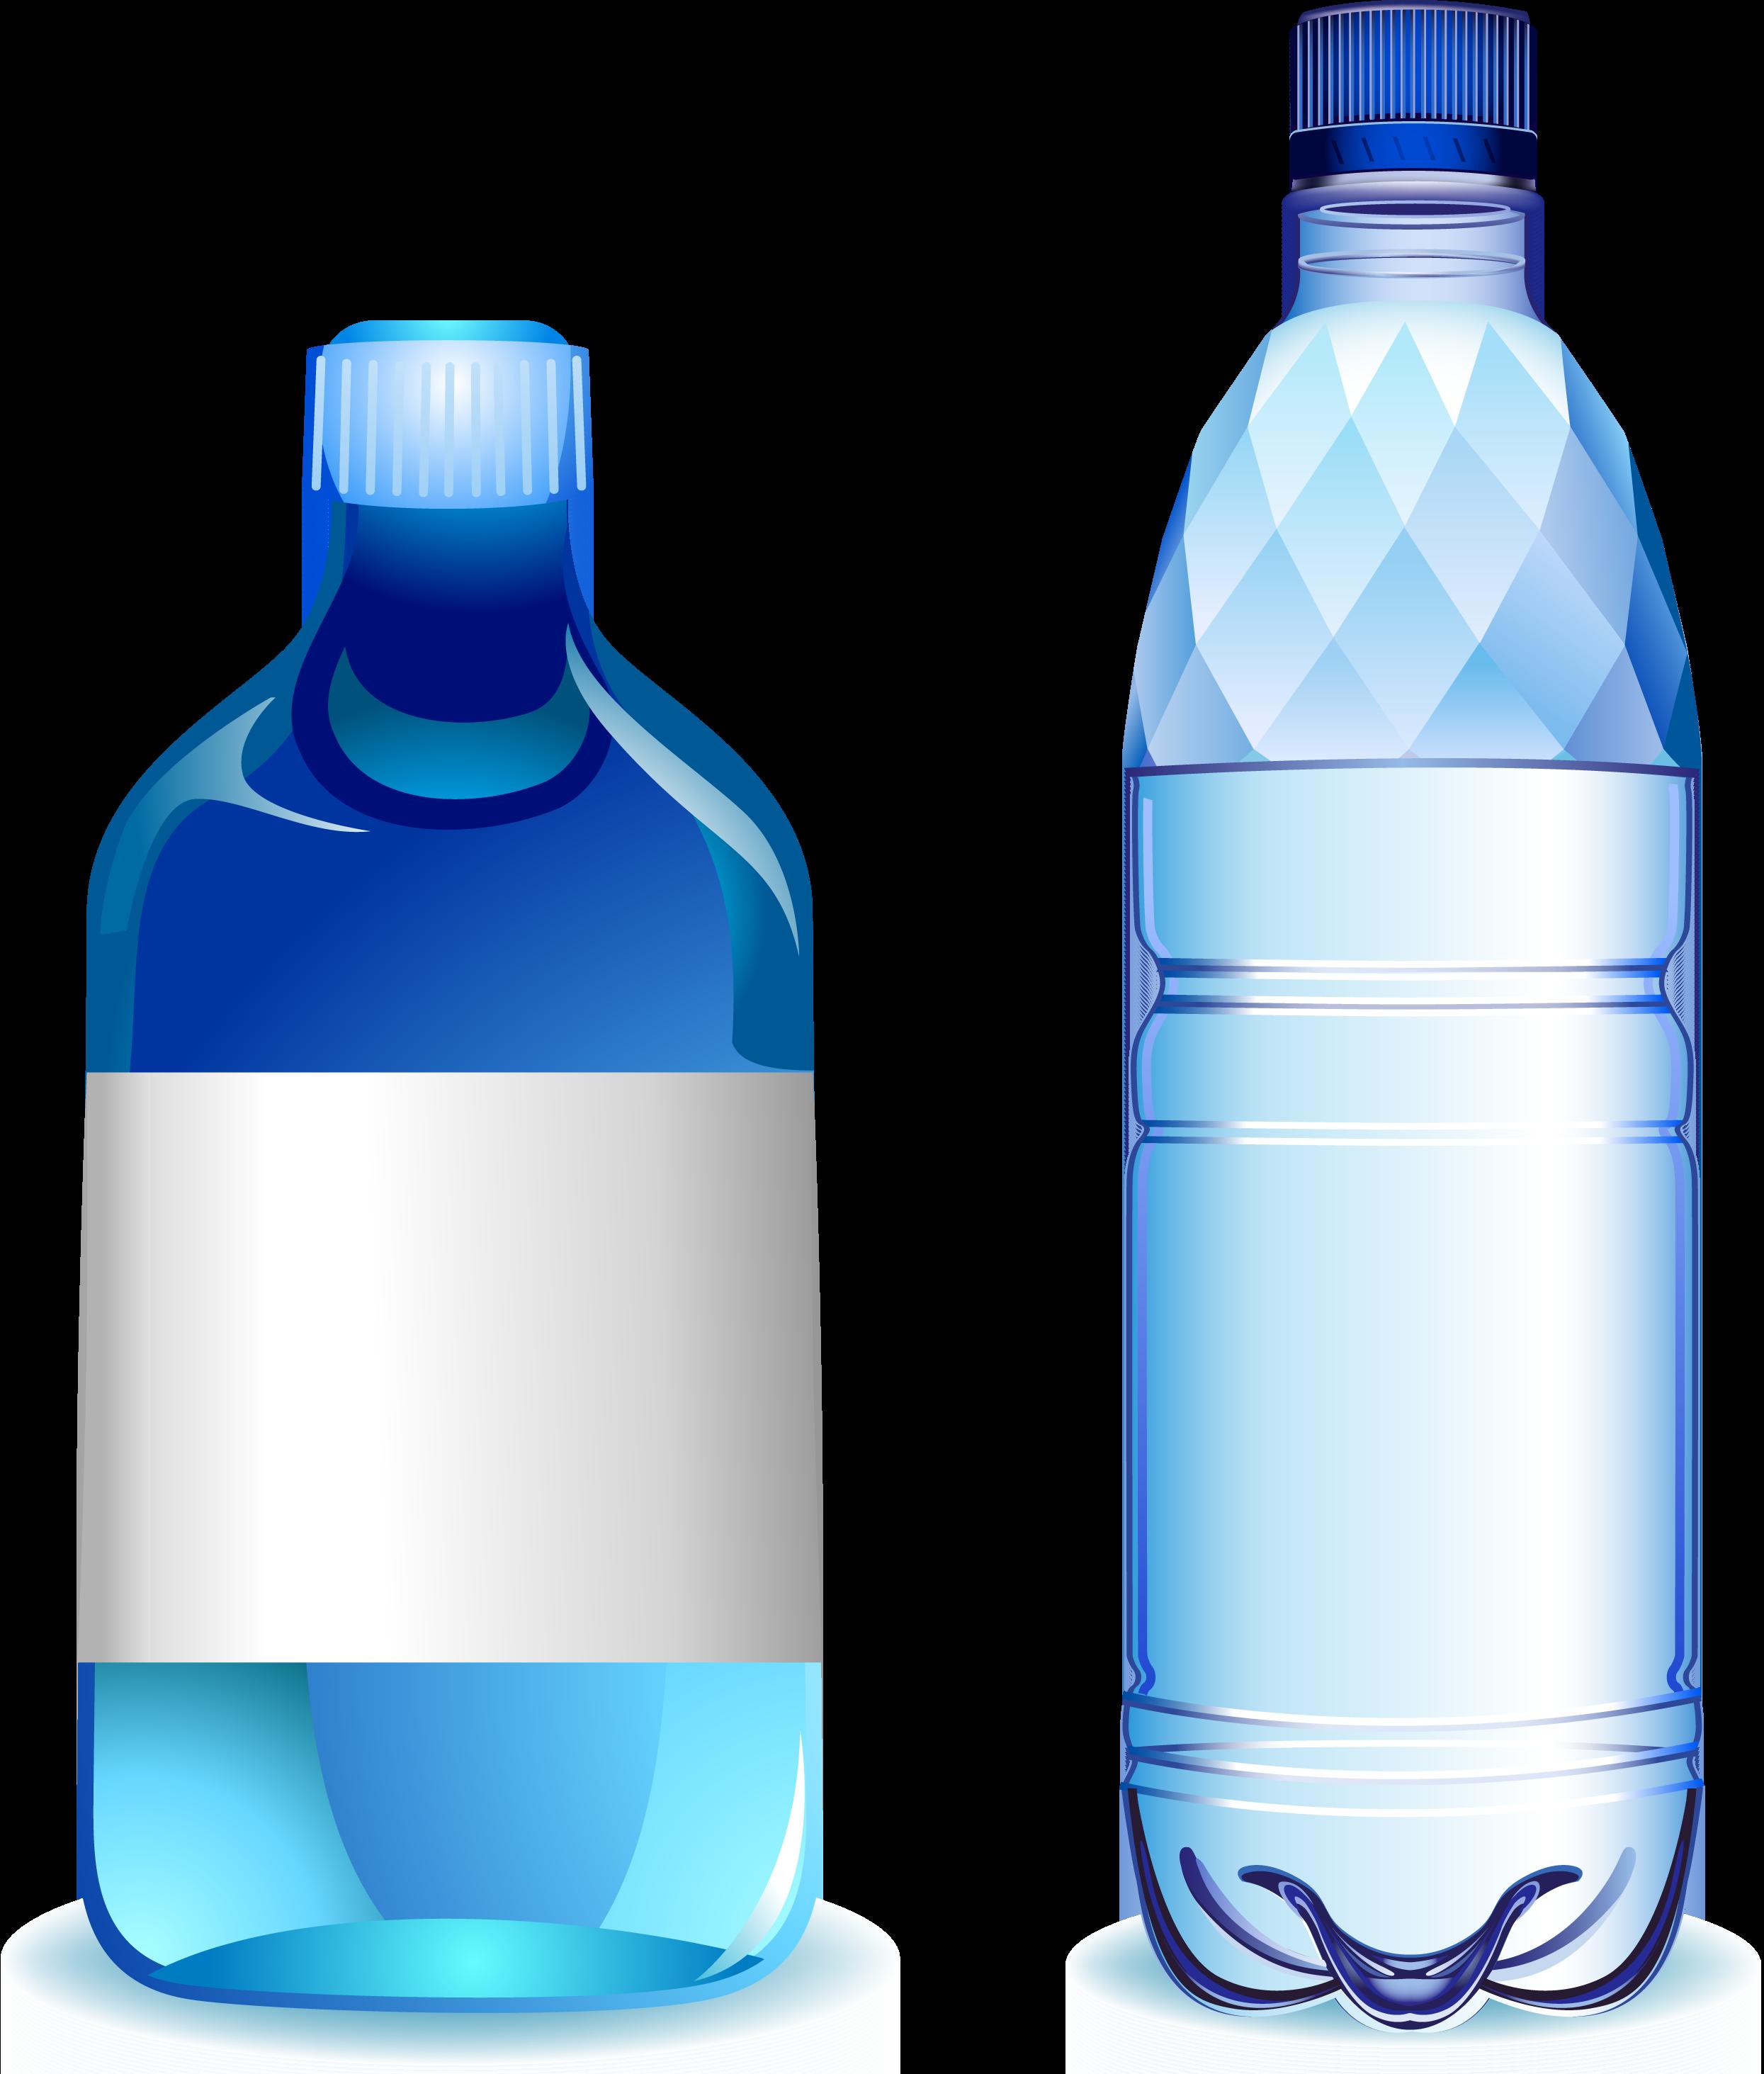 jpg black and white download Vector bottle bottled water. Plastic blue transprent png